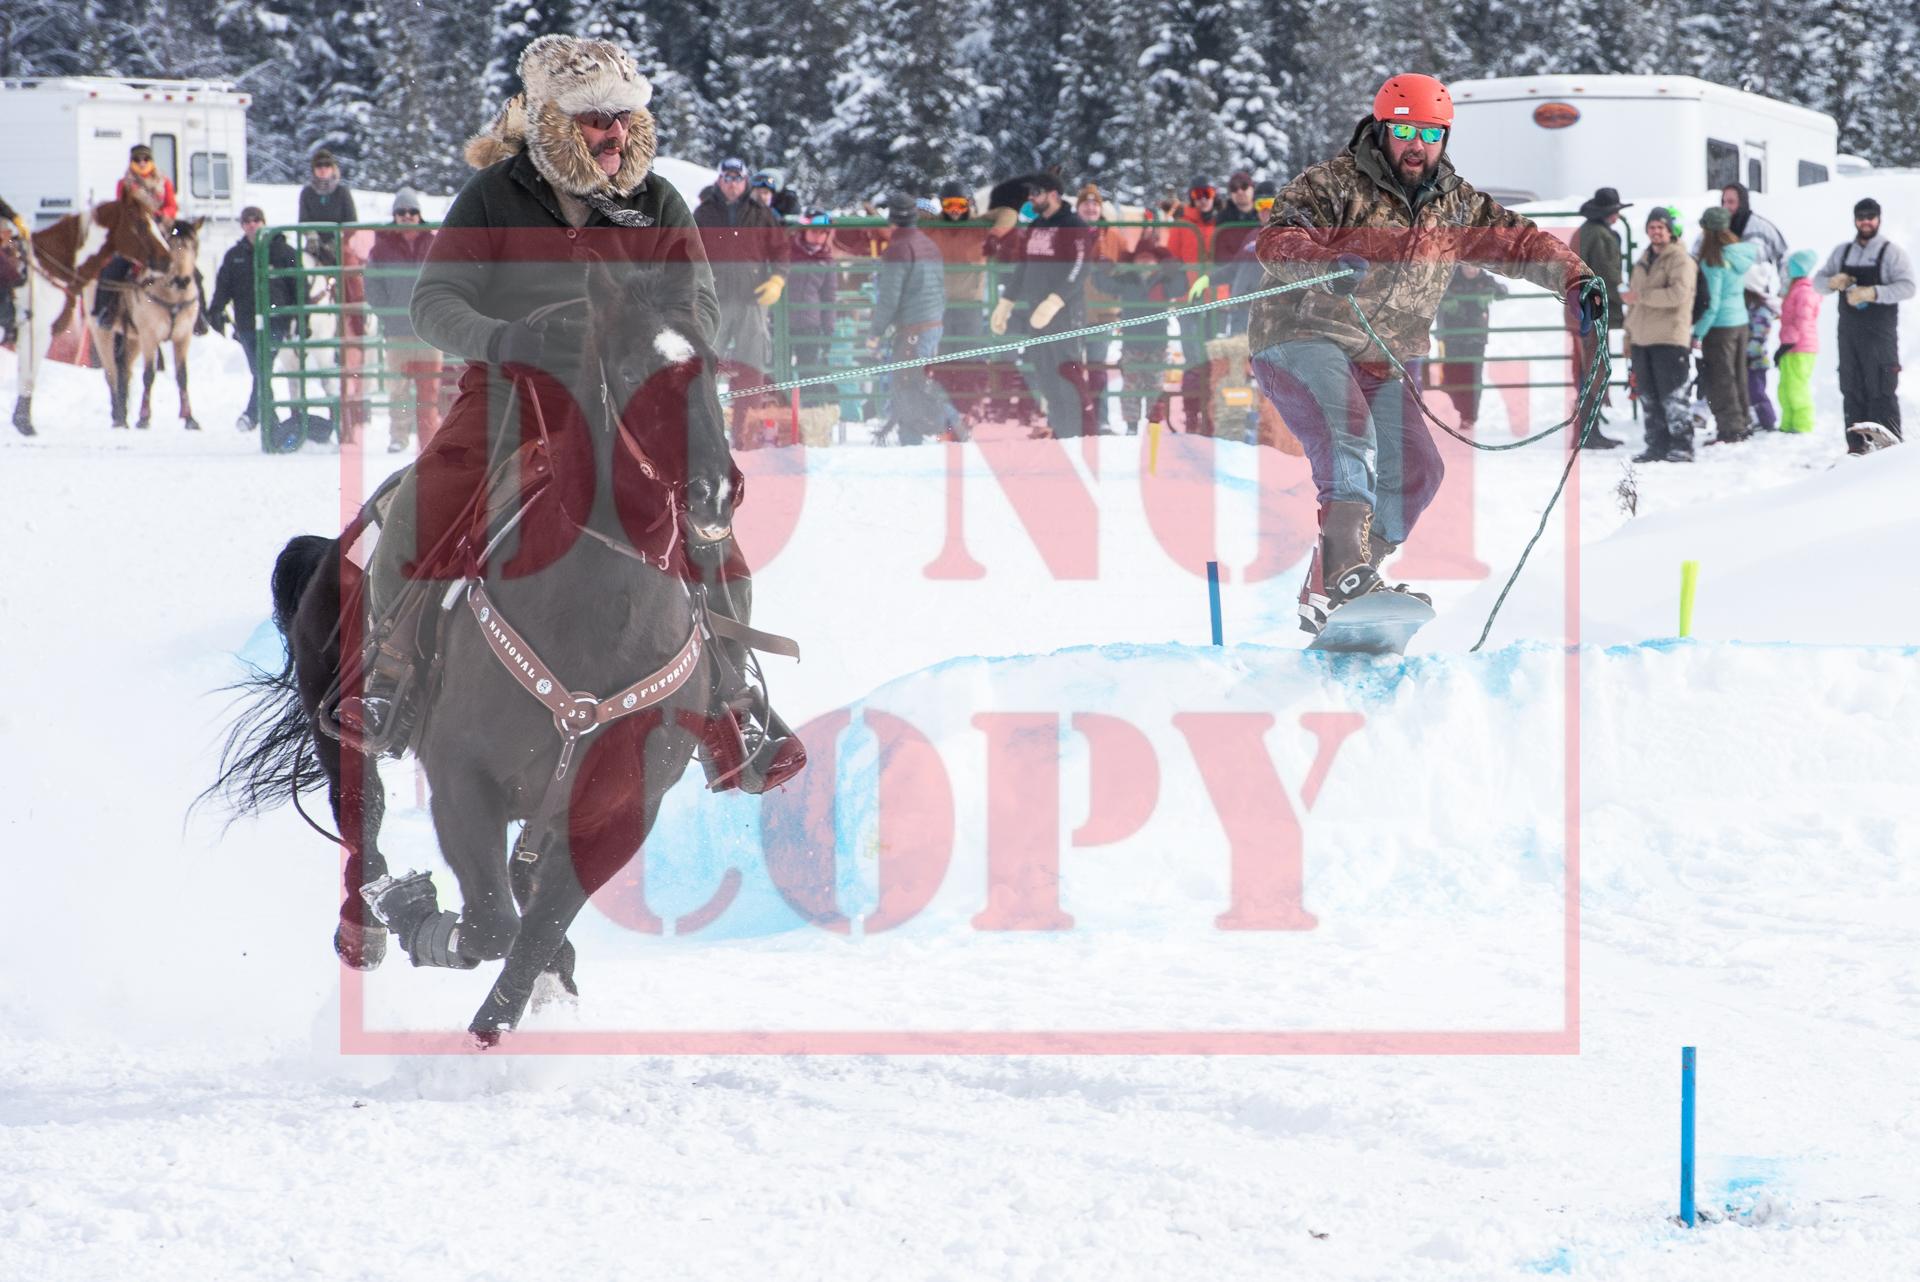 - Rick Farnsworth - Snowboard 1